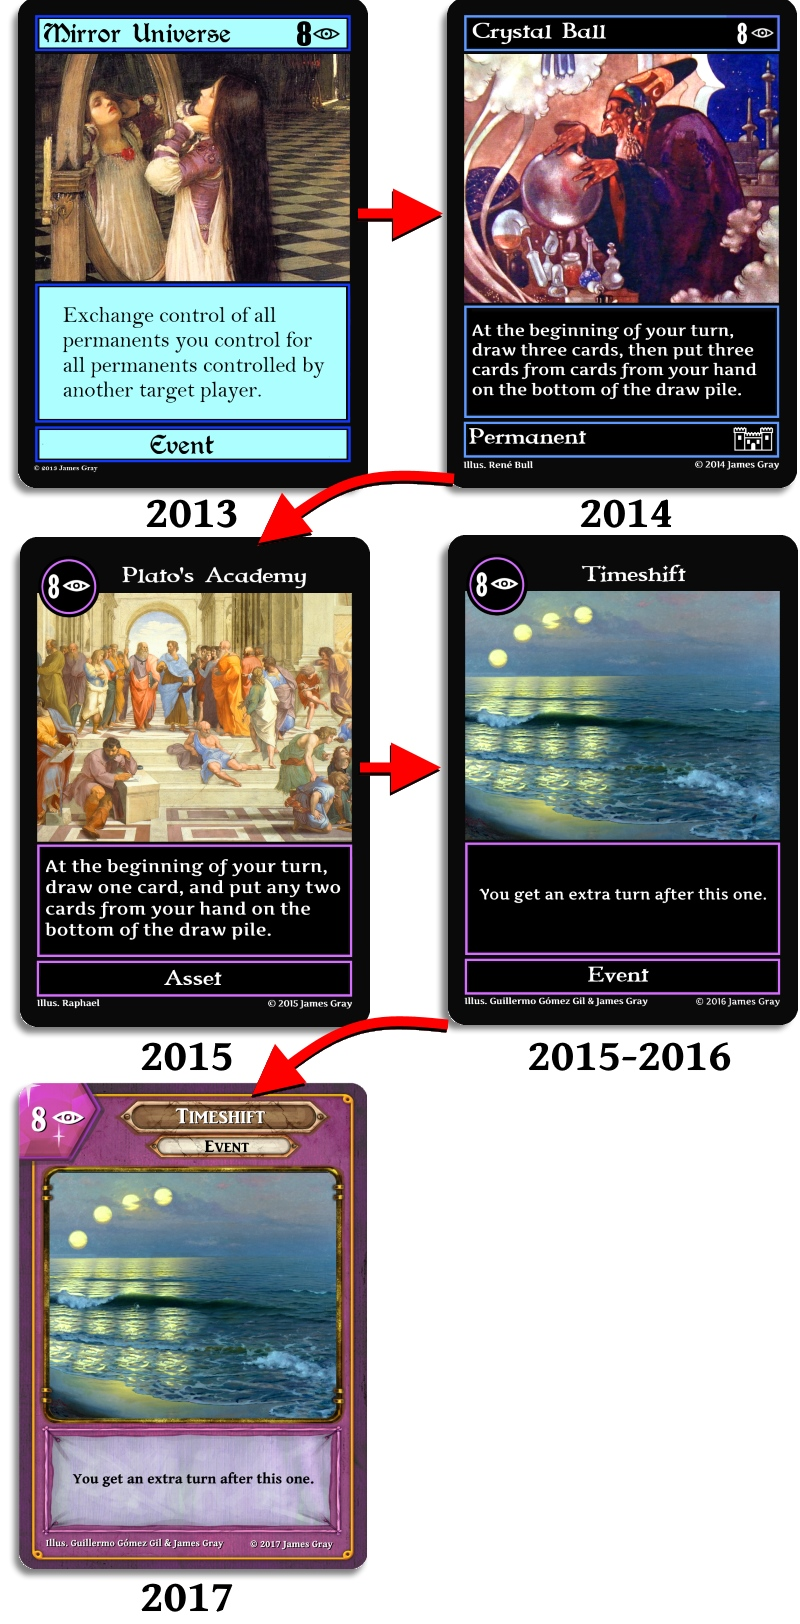 camelot evolution